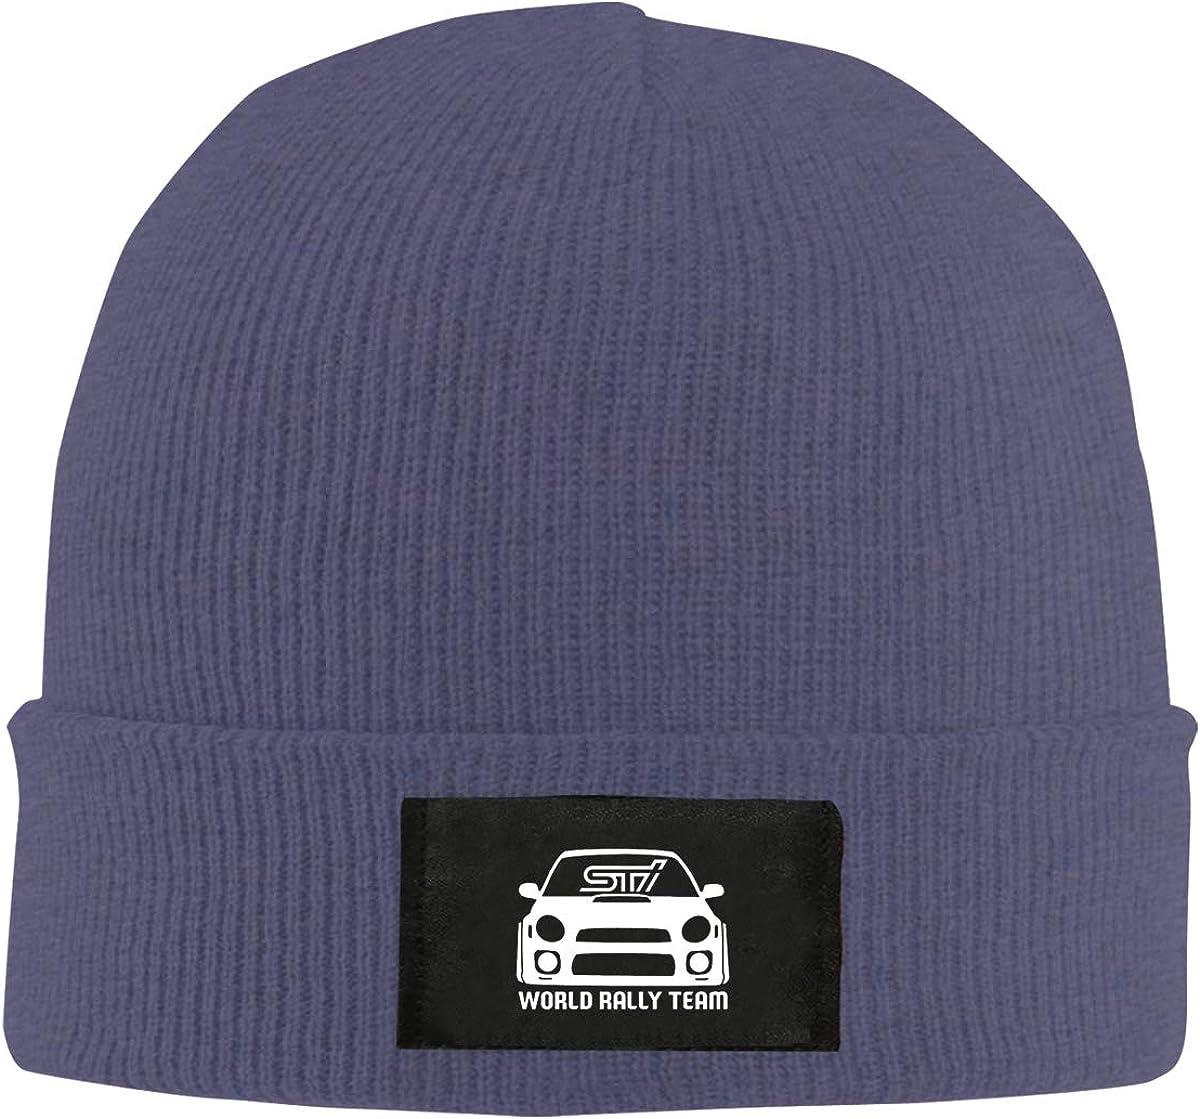 World Rally Team Racing Top Level Beanie Men Women Unisex Stylish Slouch Beanie Hats Black